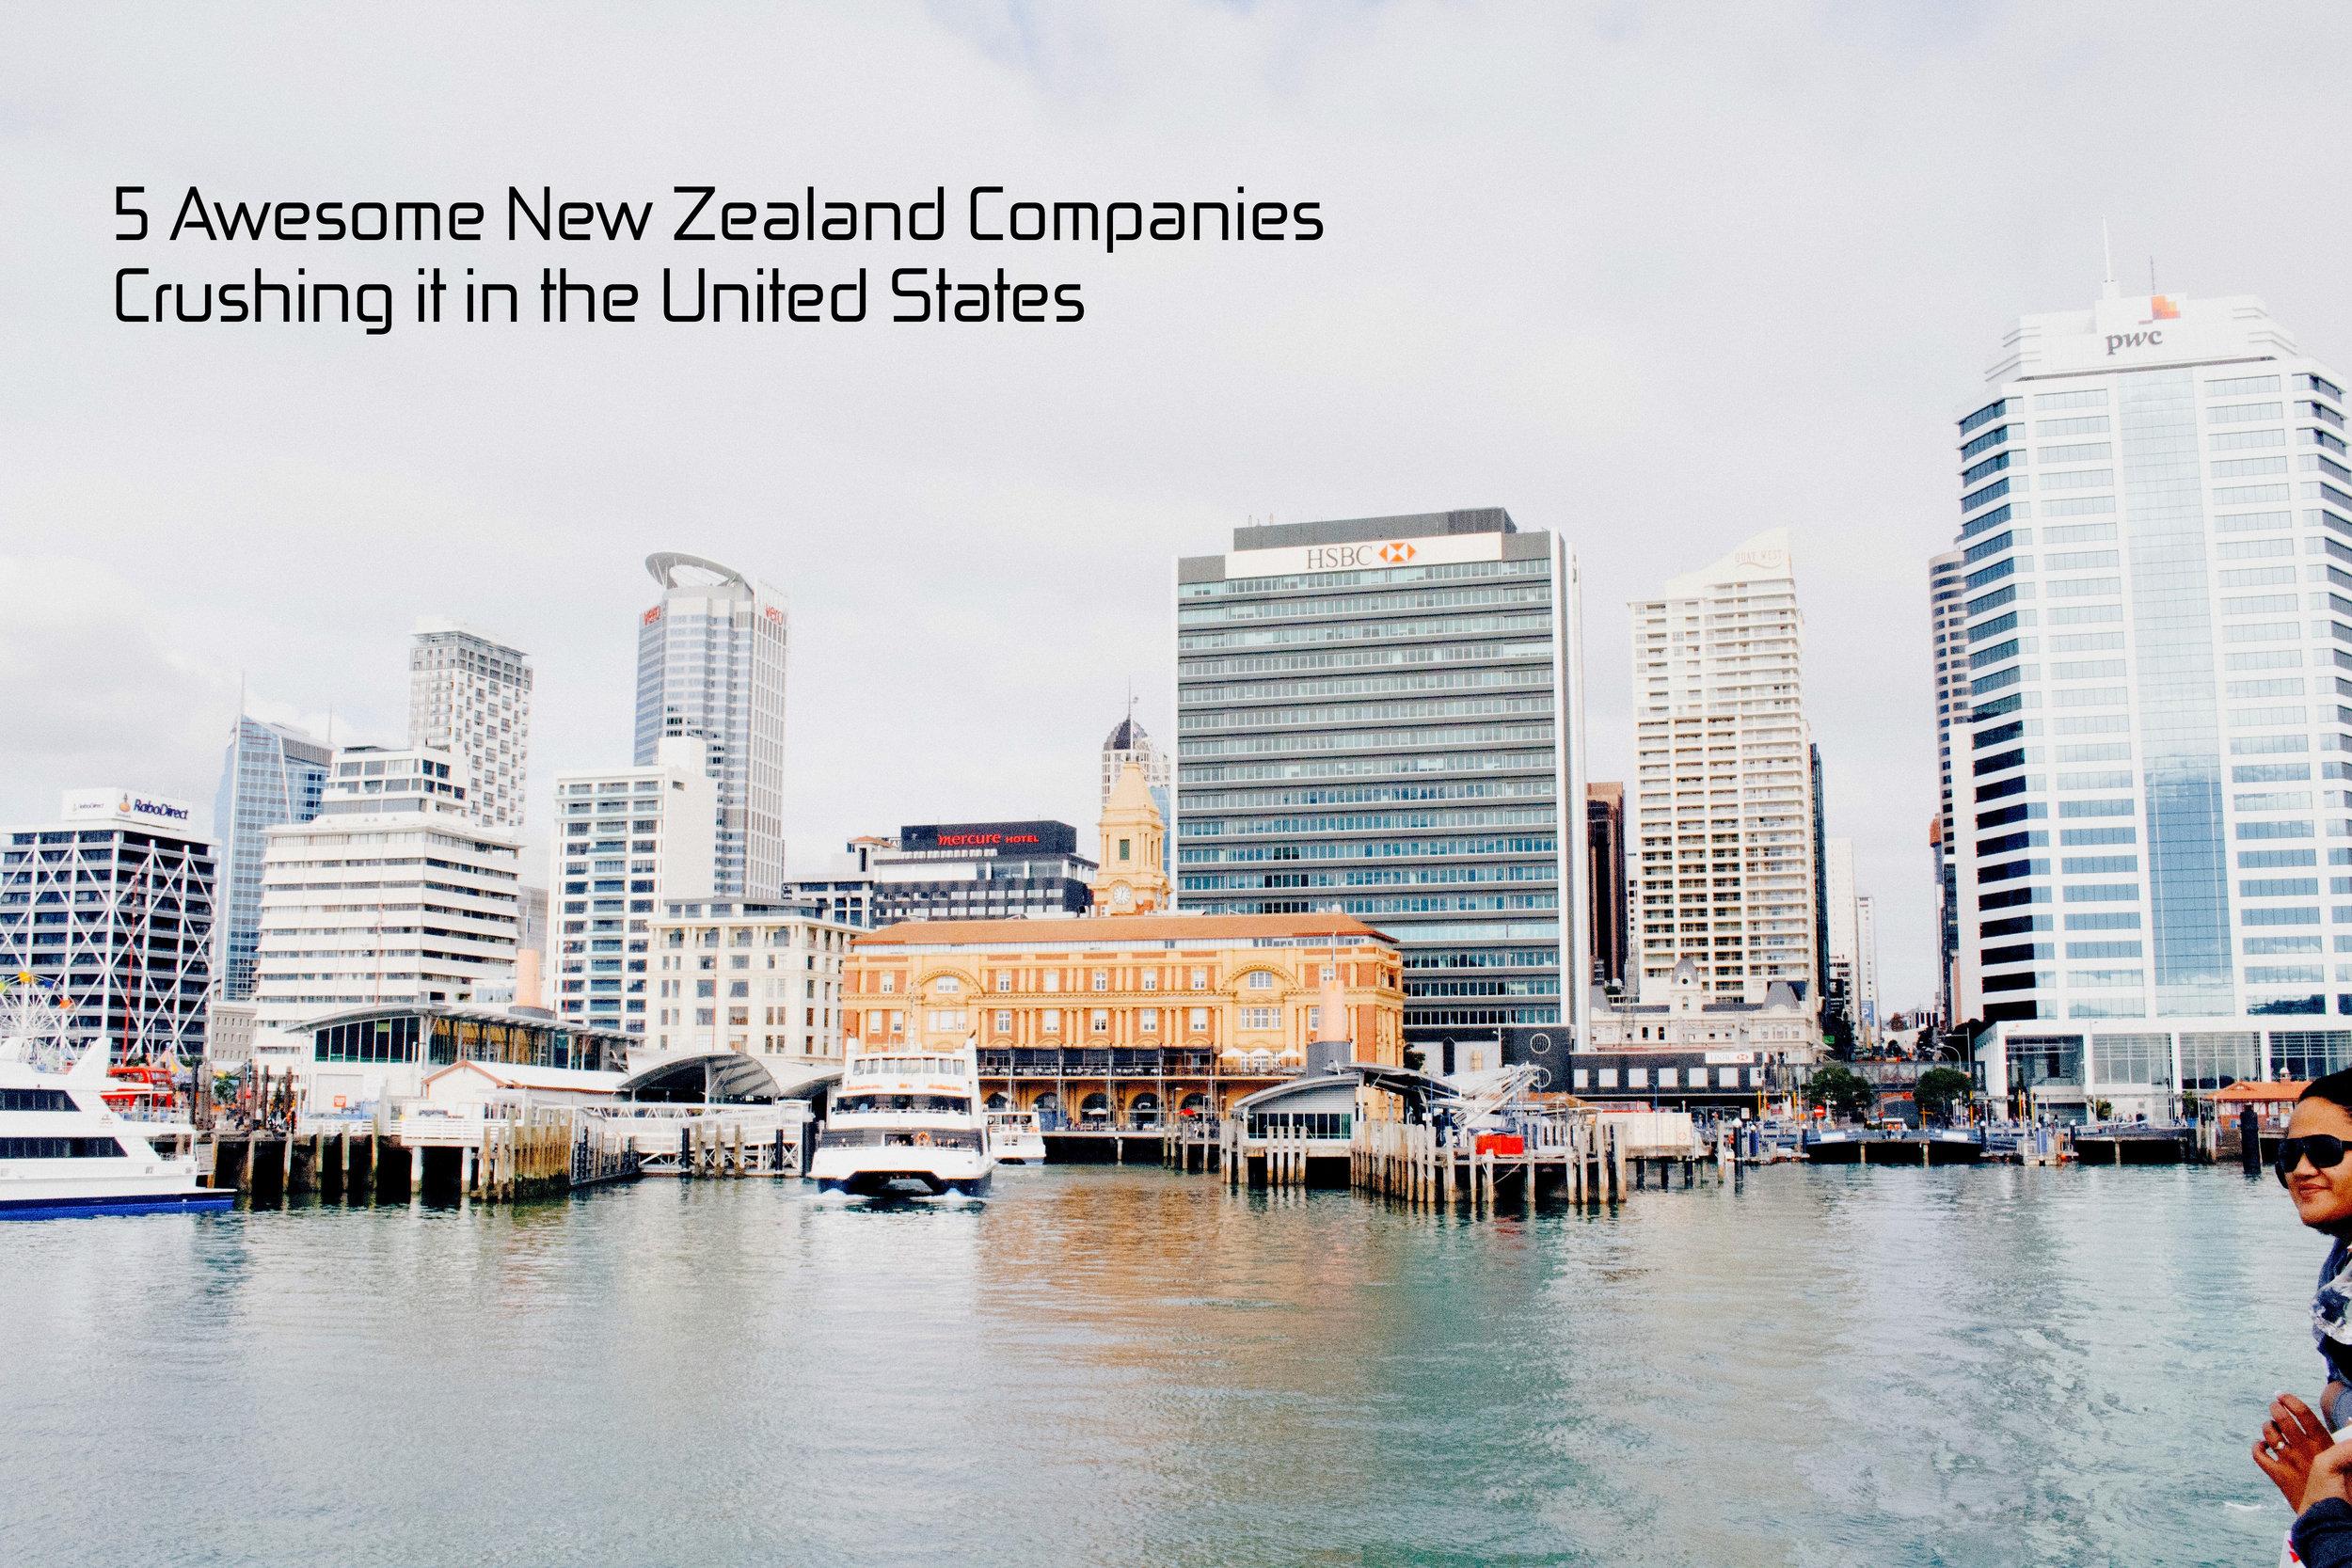 New-Zealand-Companies-United-States.jpg